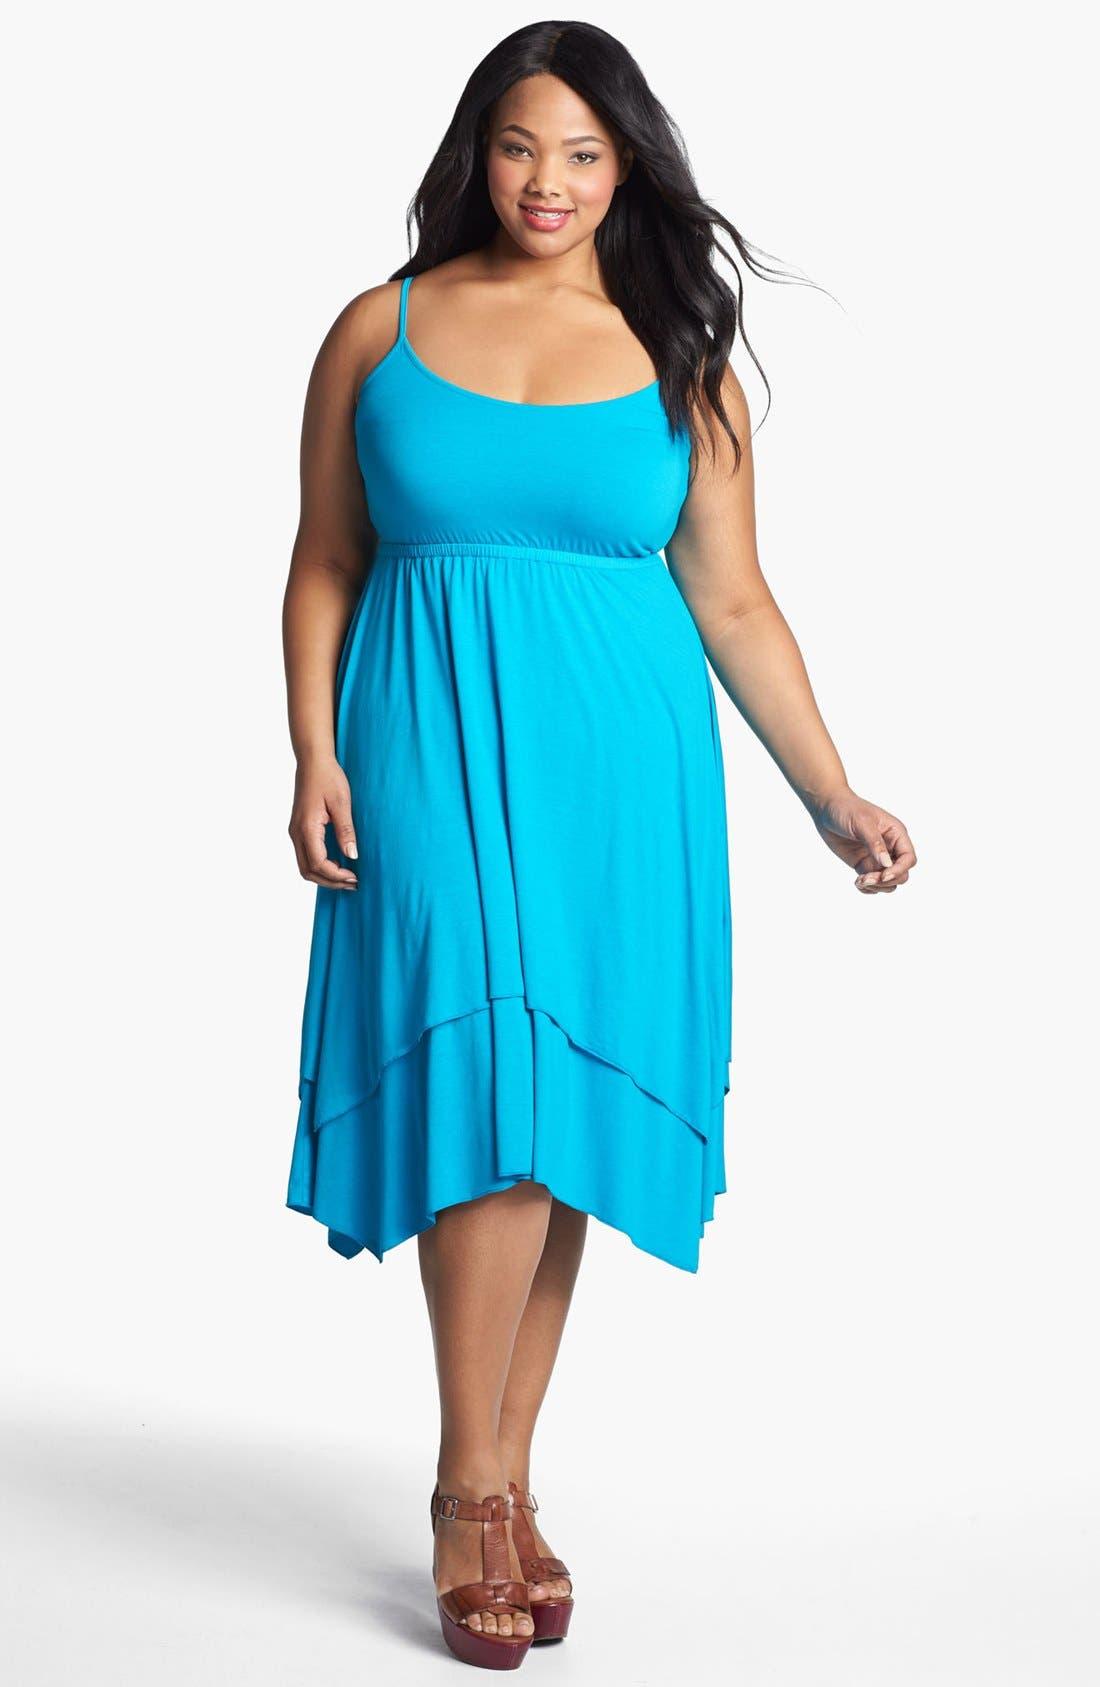 Main Image - Three Dots Layered Skirt Sundress (Plus Size)